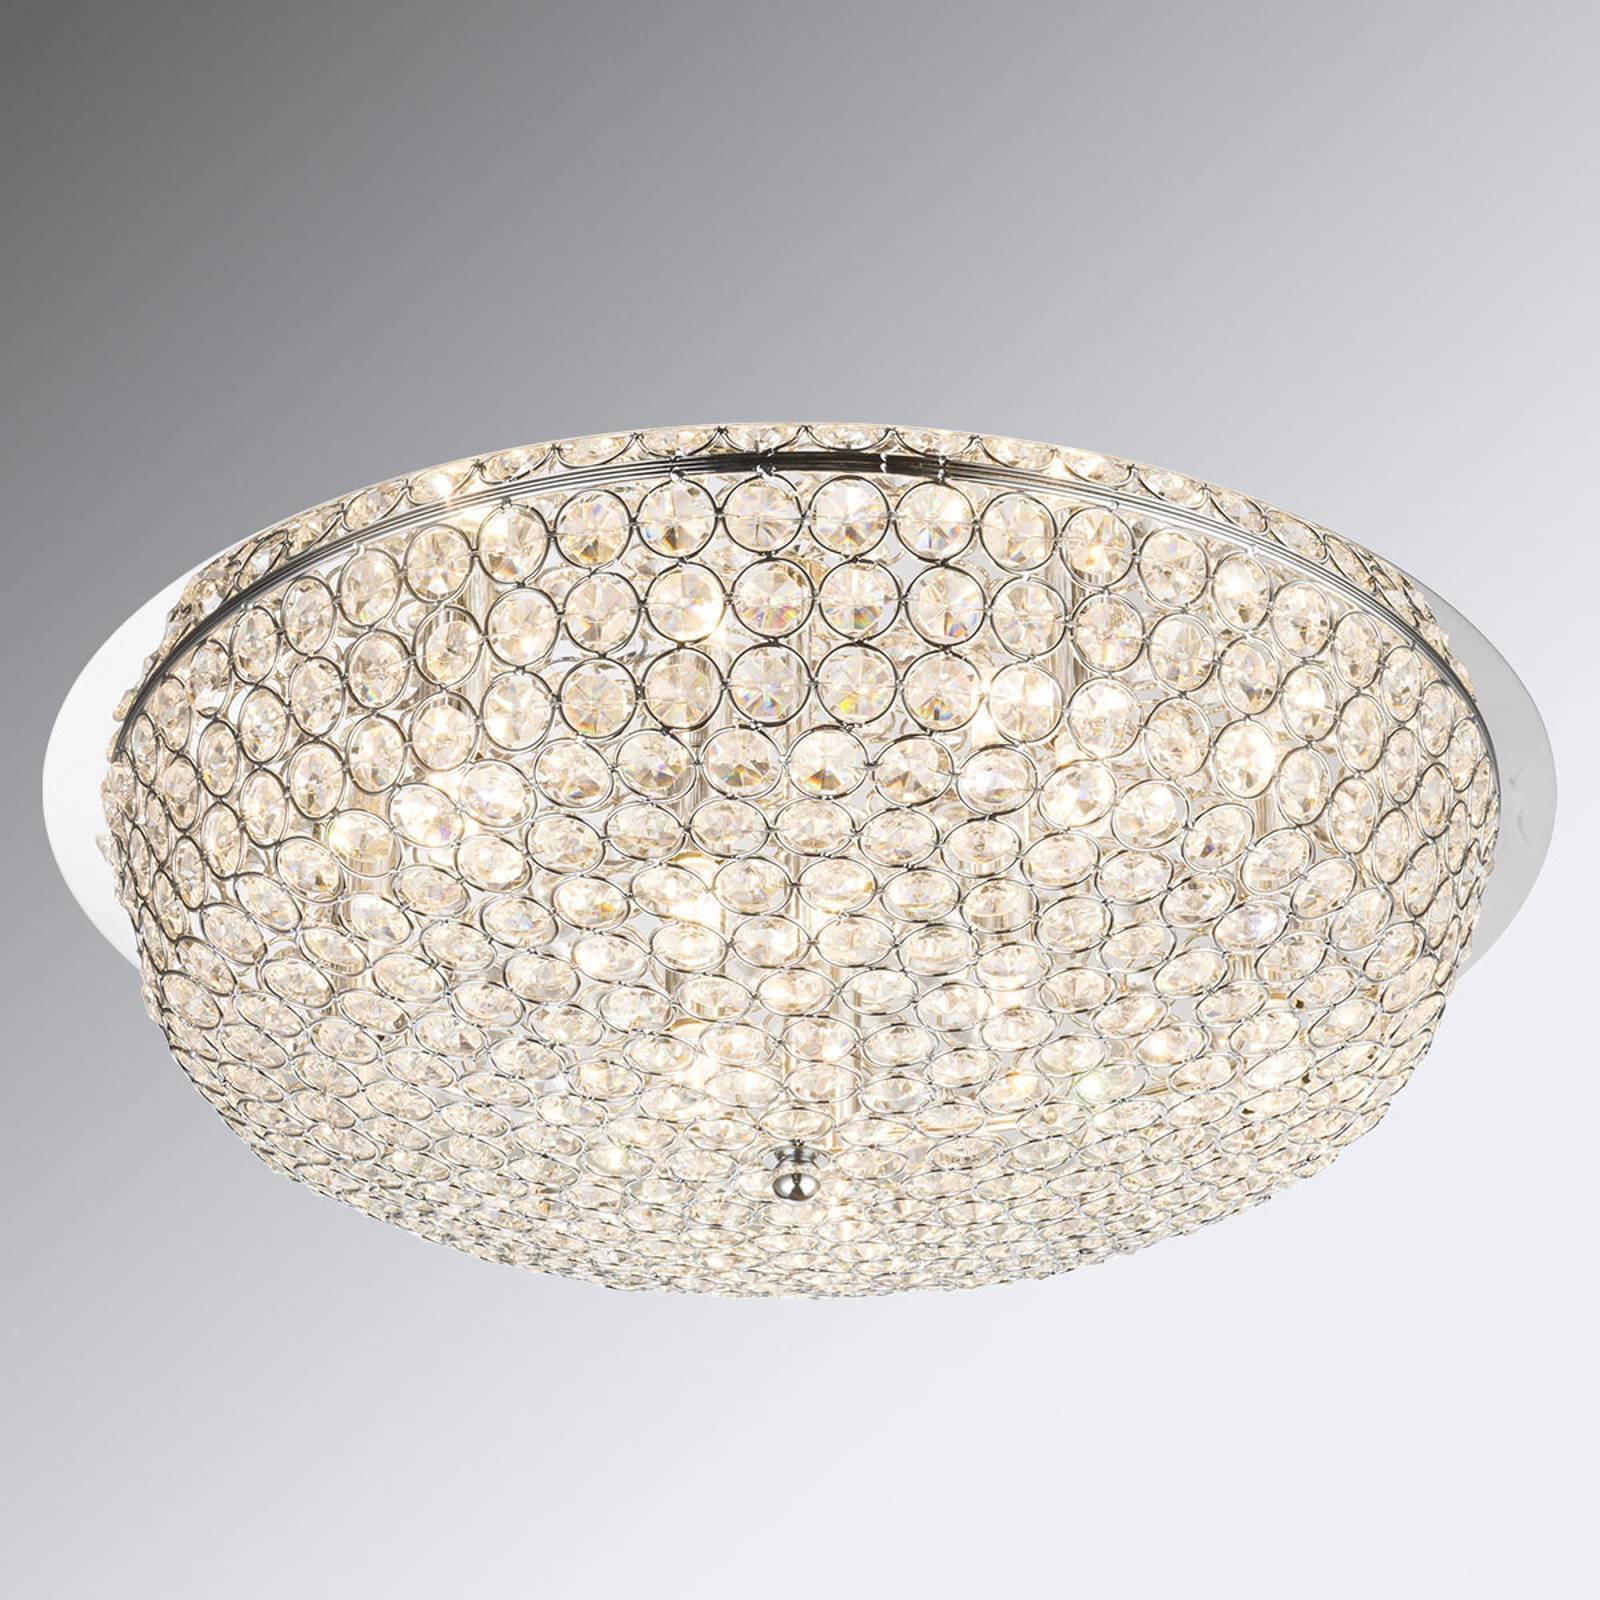 Taklampe Emilia i krystall, med LED-pærer